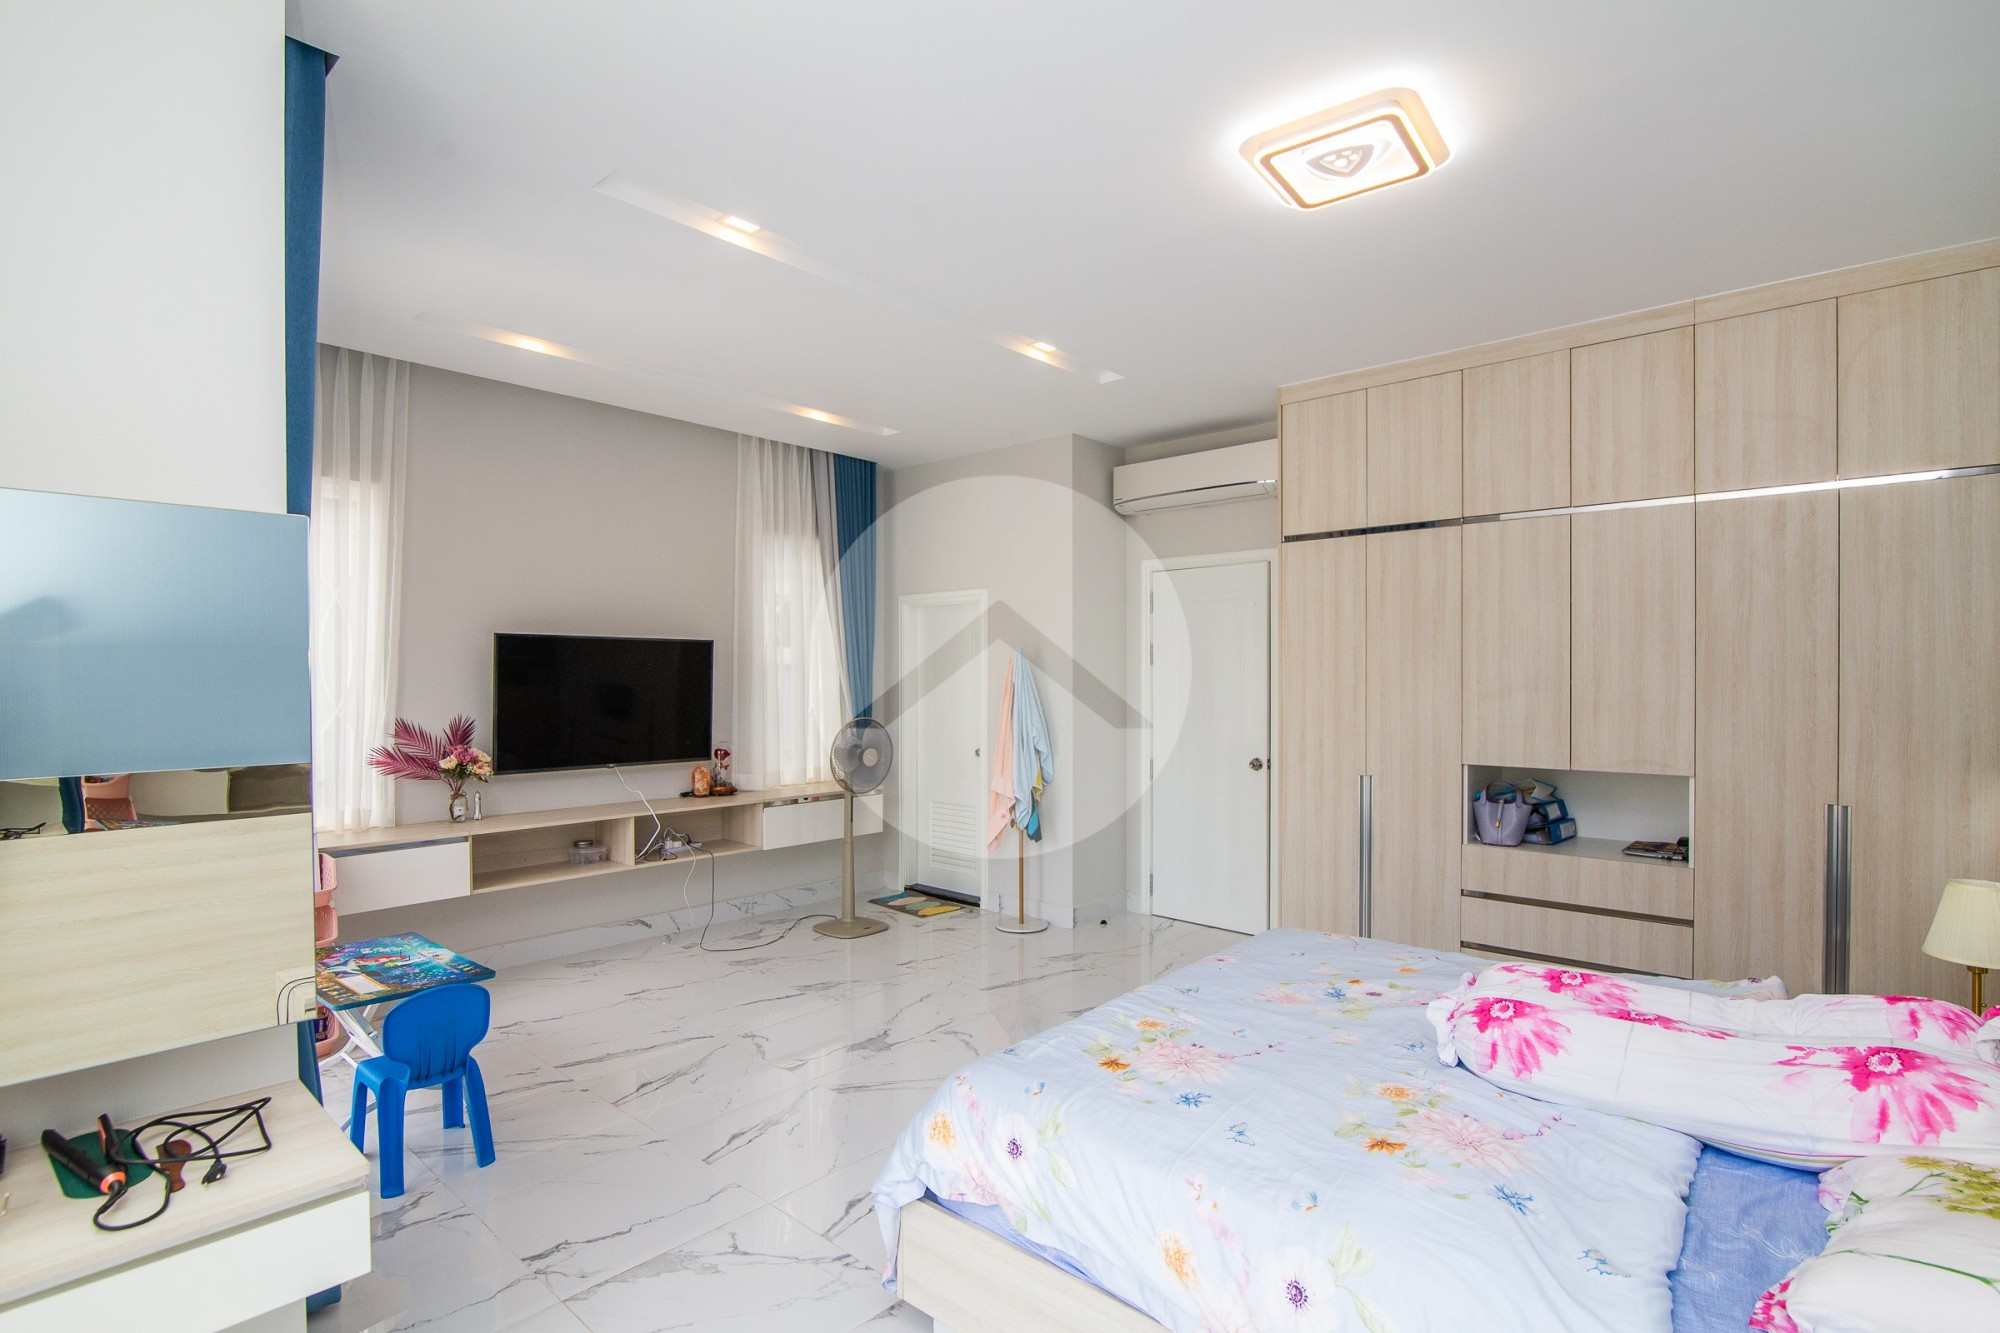 4 Bedroom Twin Villa For Rent - Sen Sok, Phnom Penh